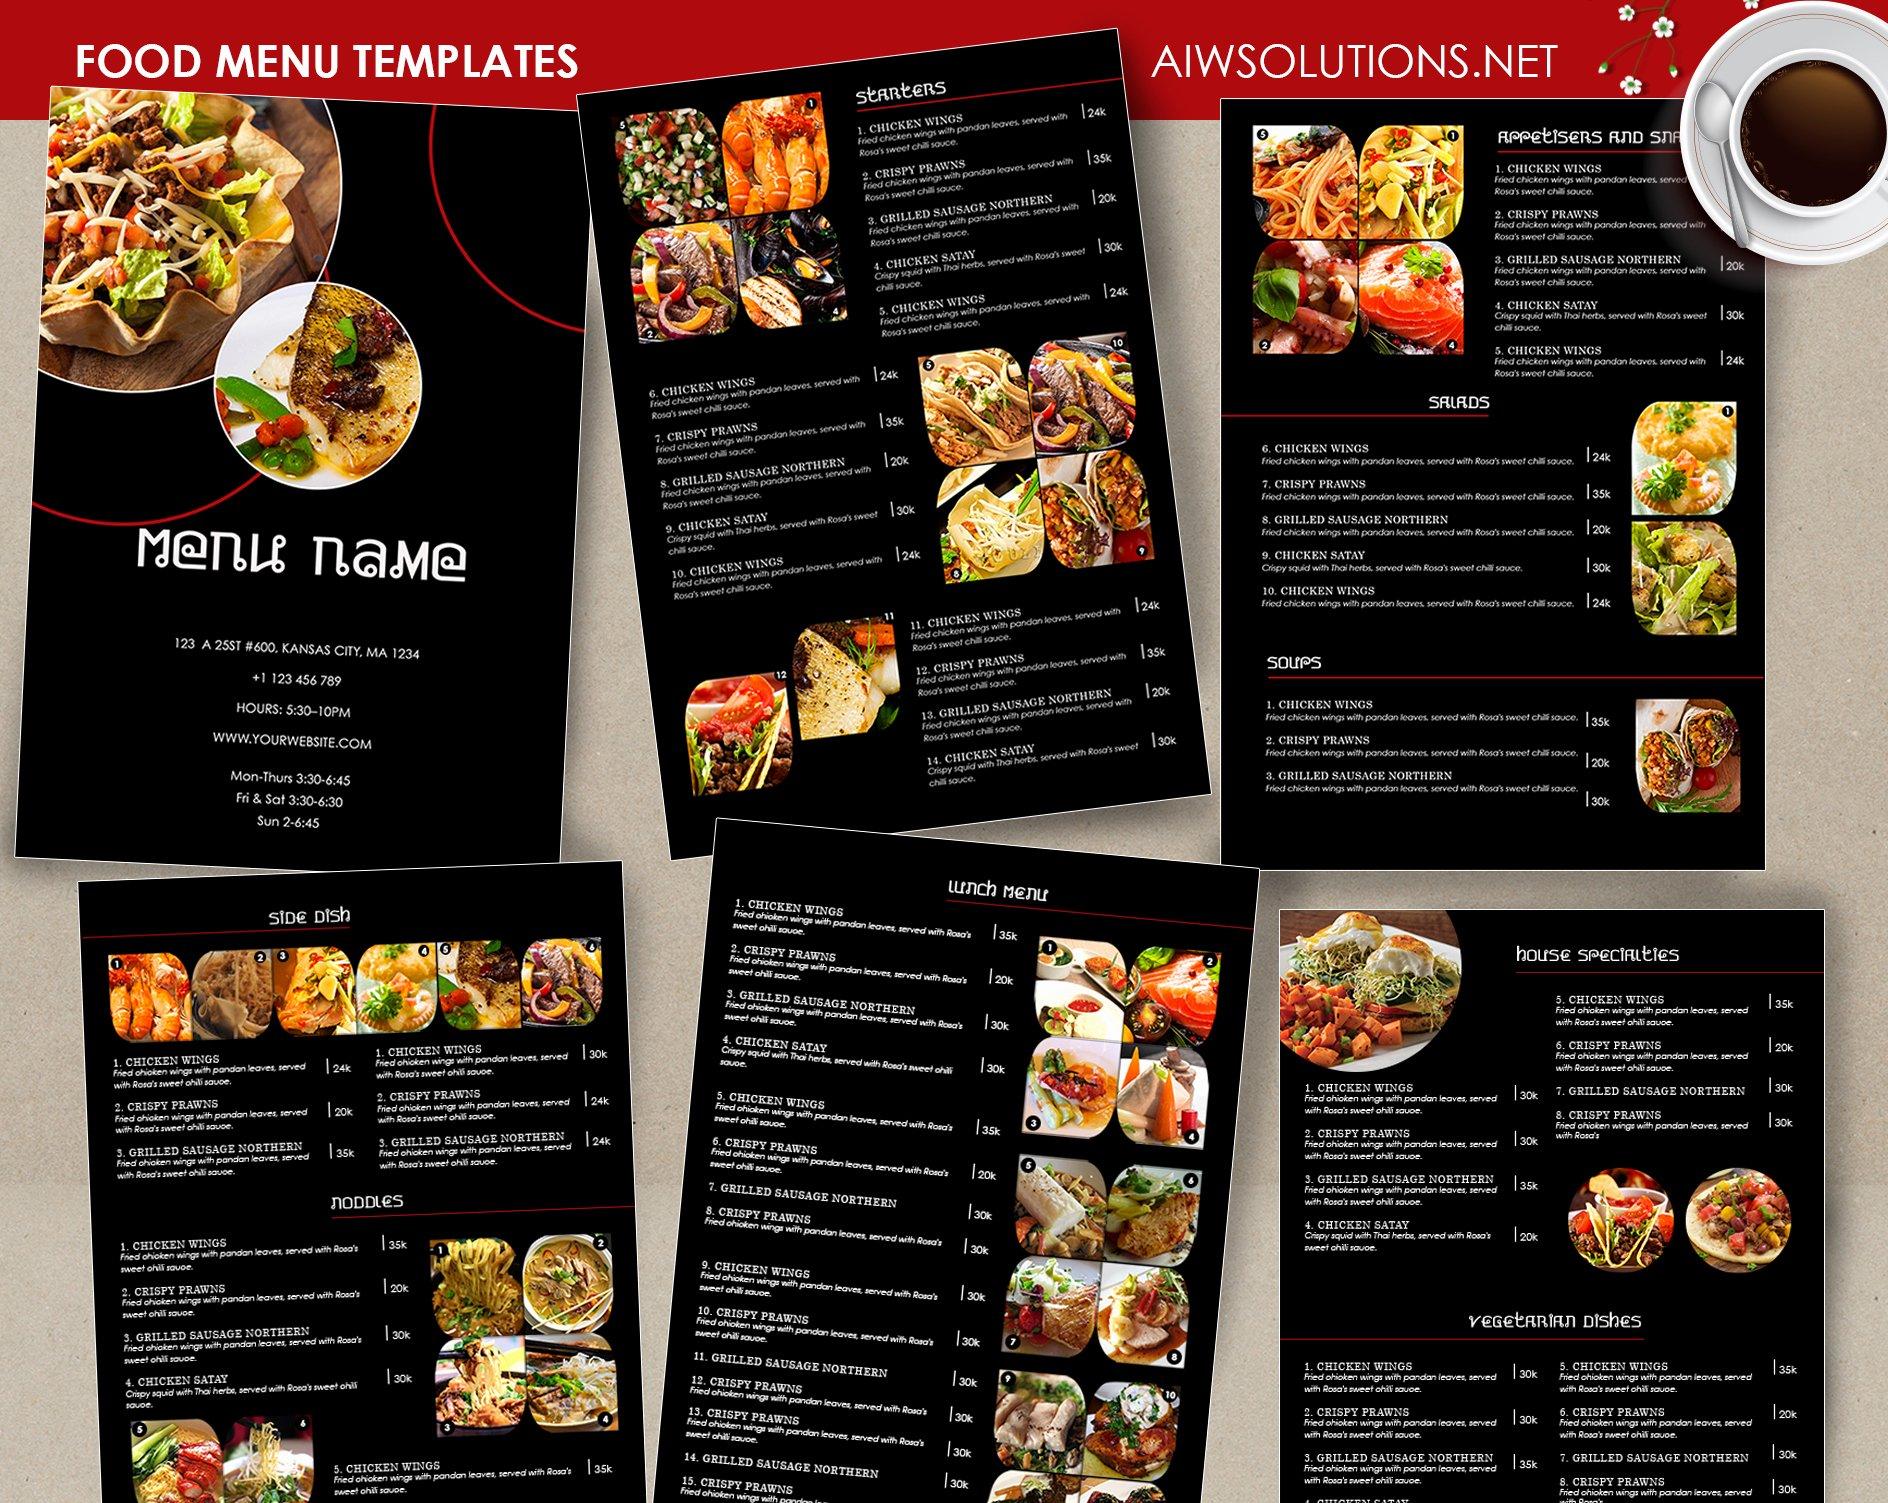 Free Catering Menu Templates Beautiful Food Menu Restaurant Menu – Aiwsolutions